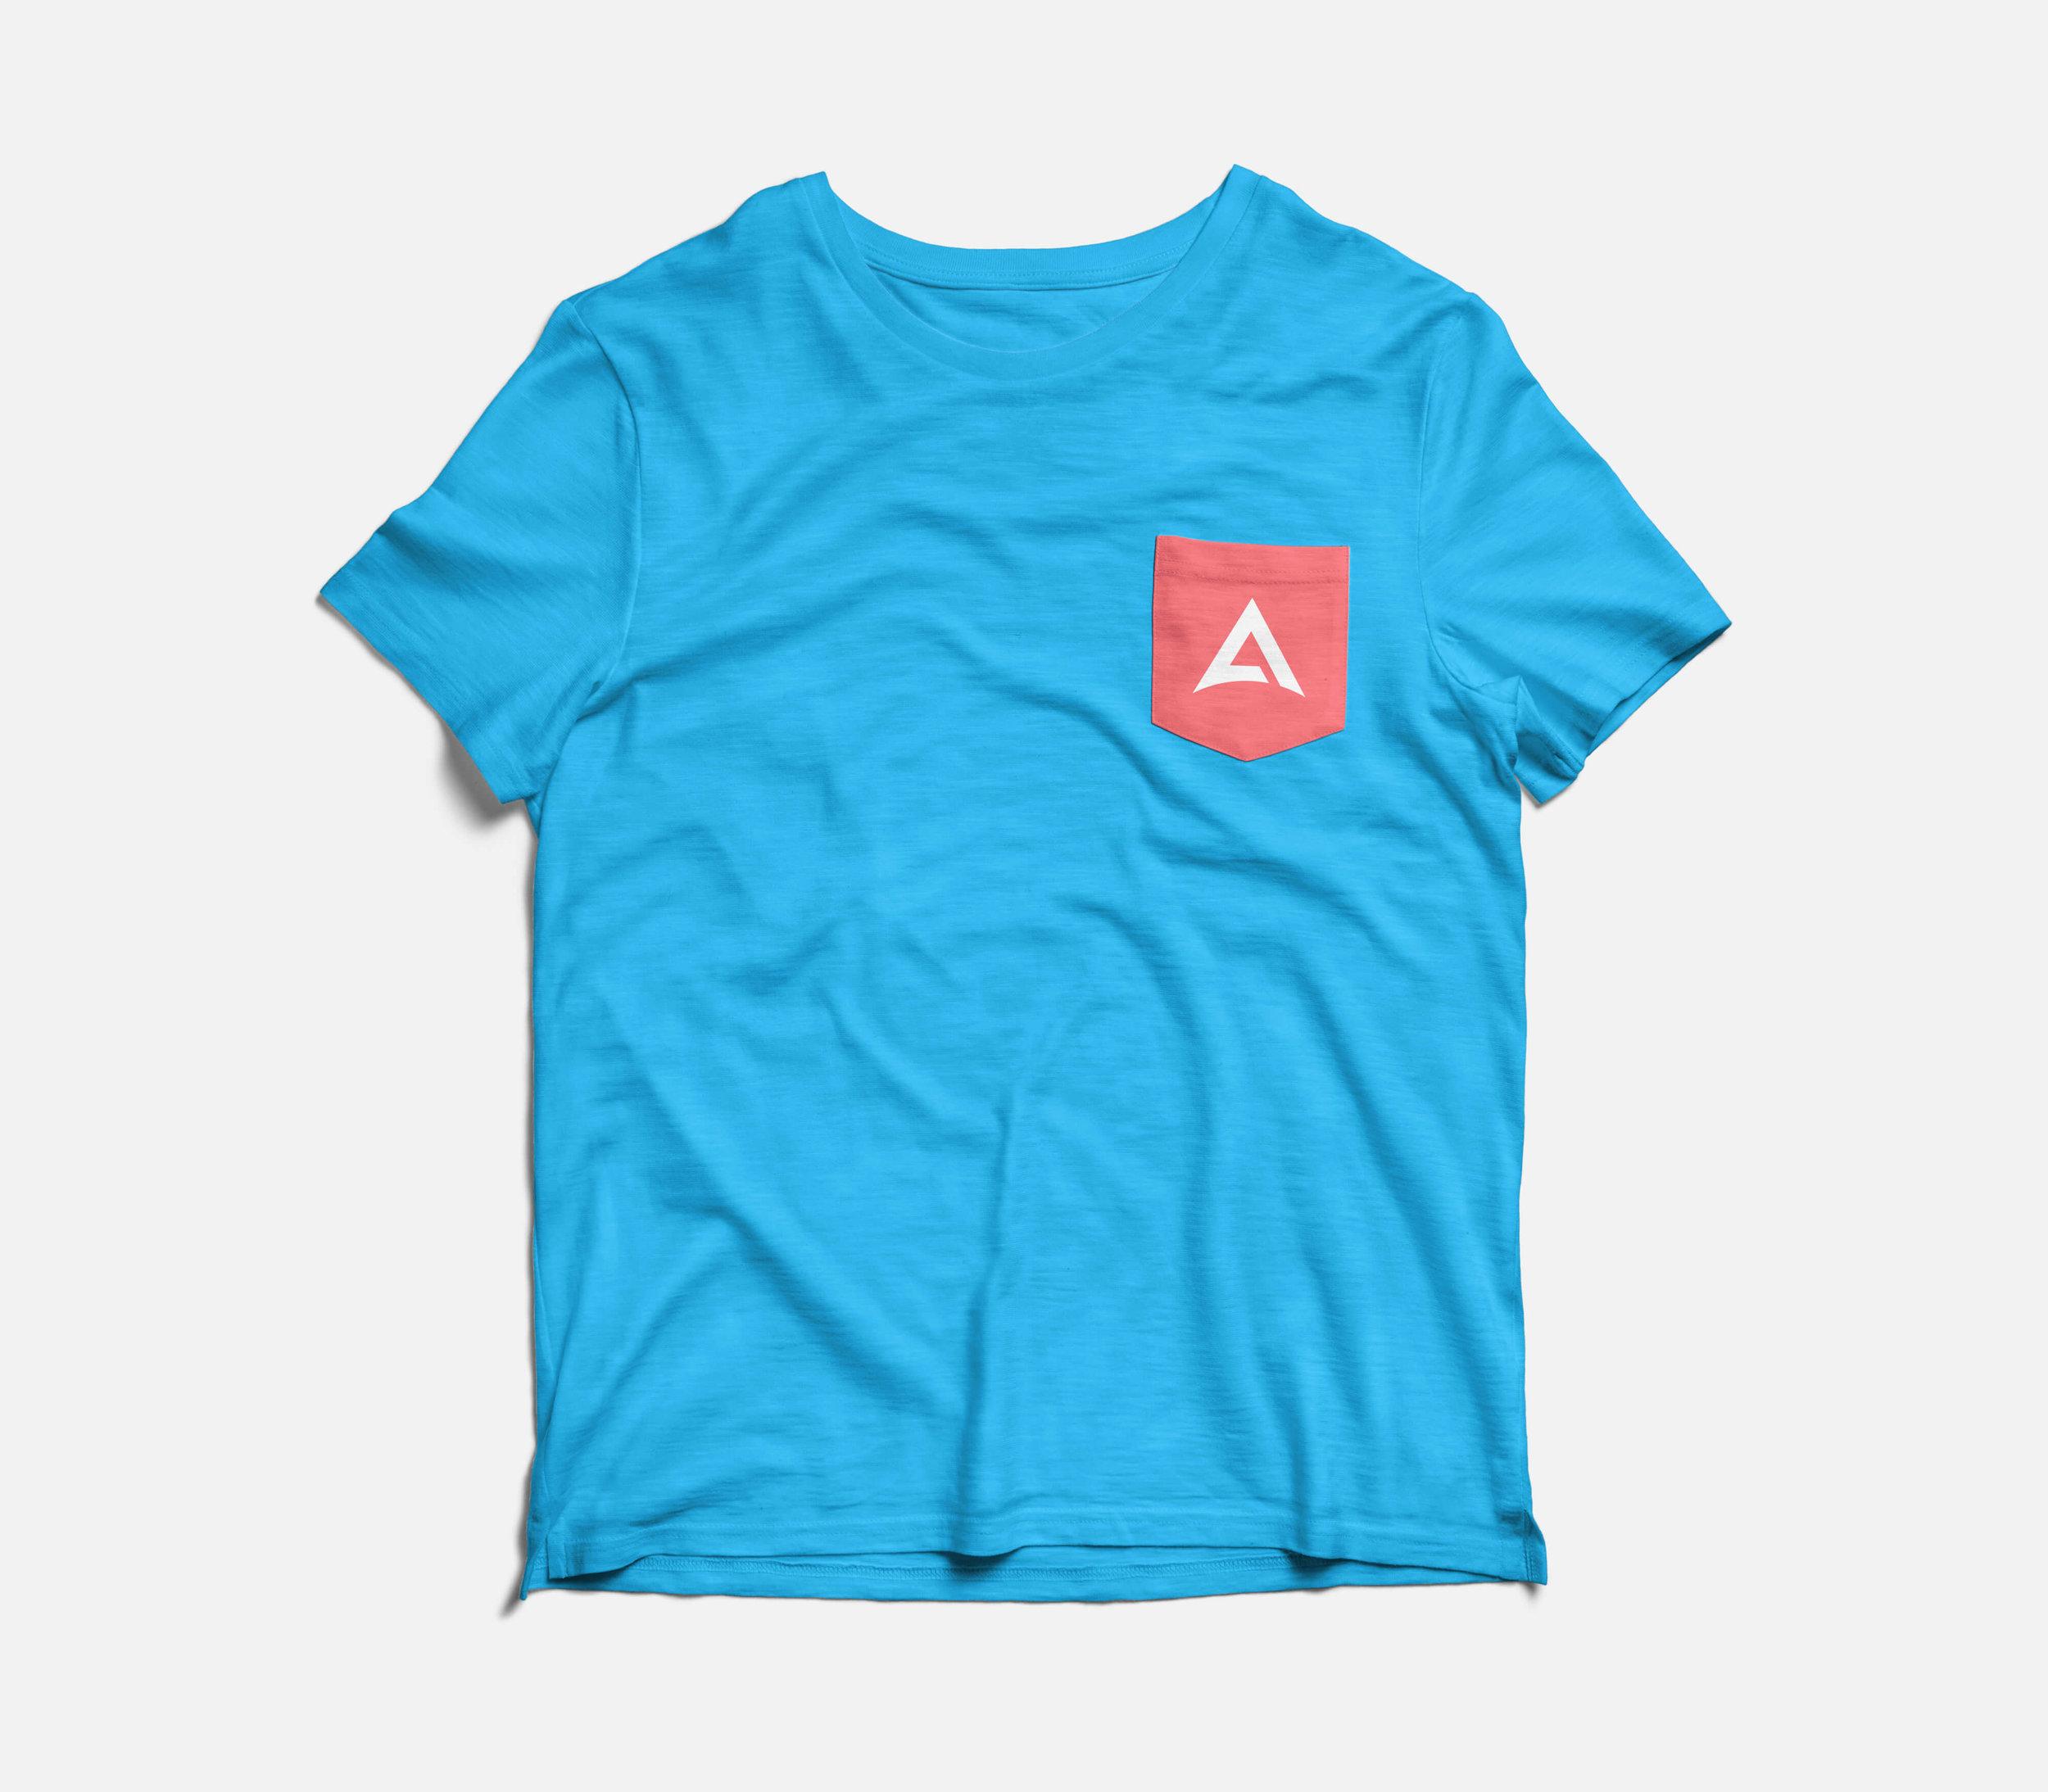 al_shirt_Front.jpg